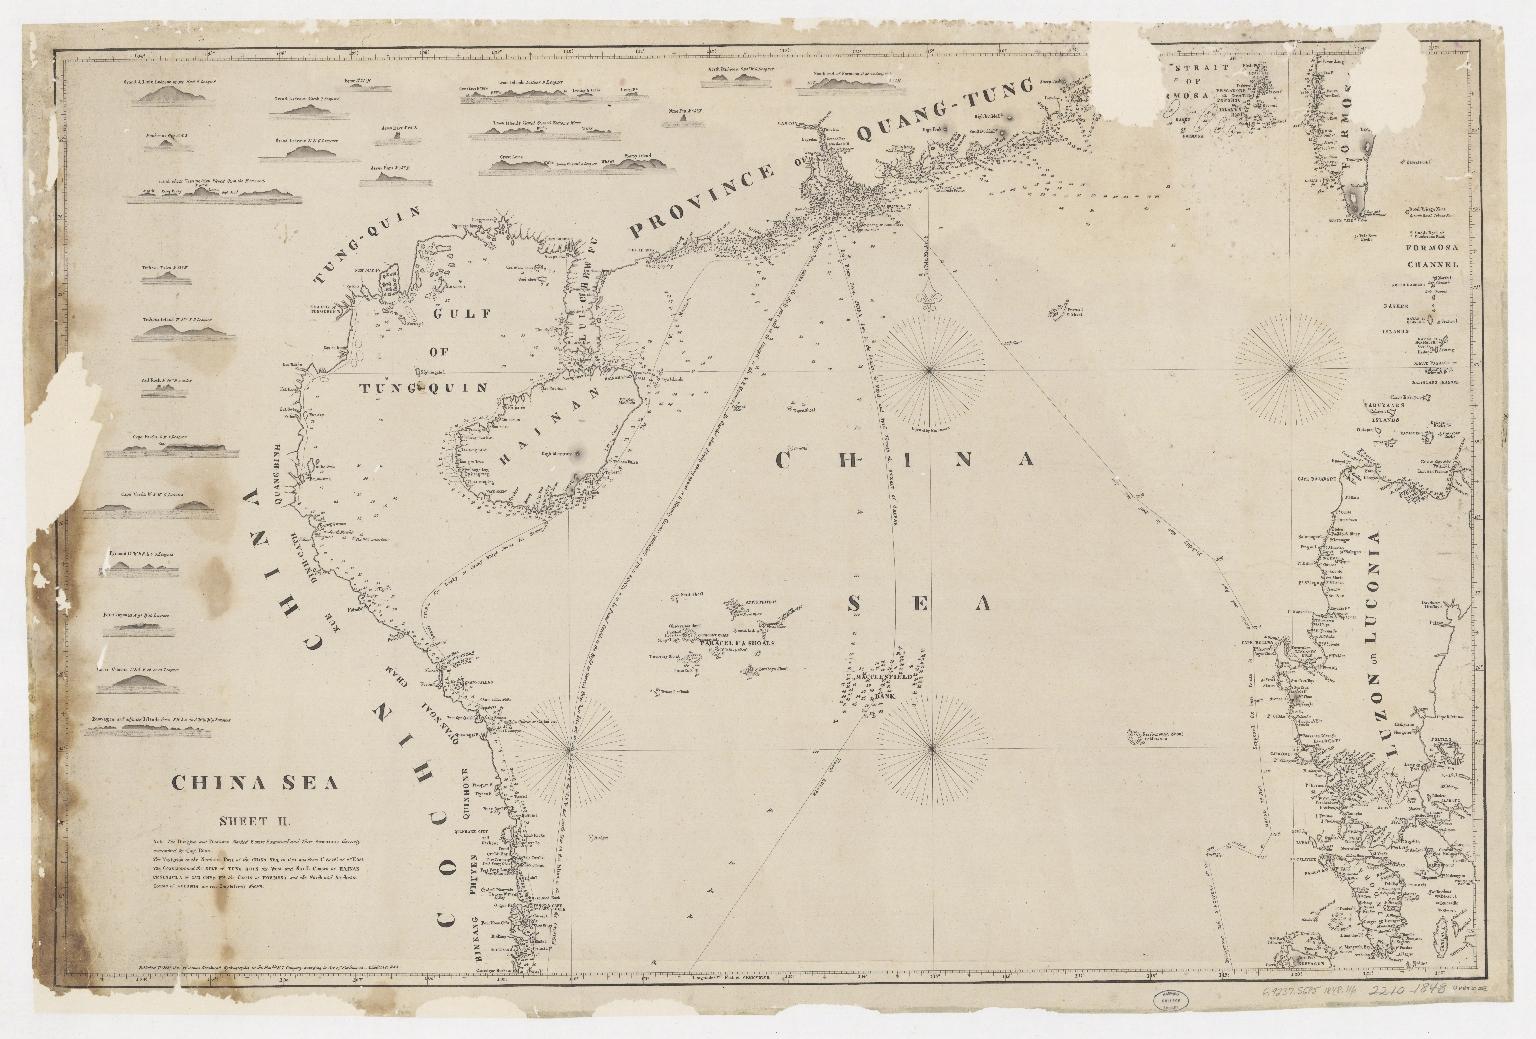 China Sea. Sheet II